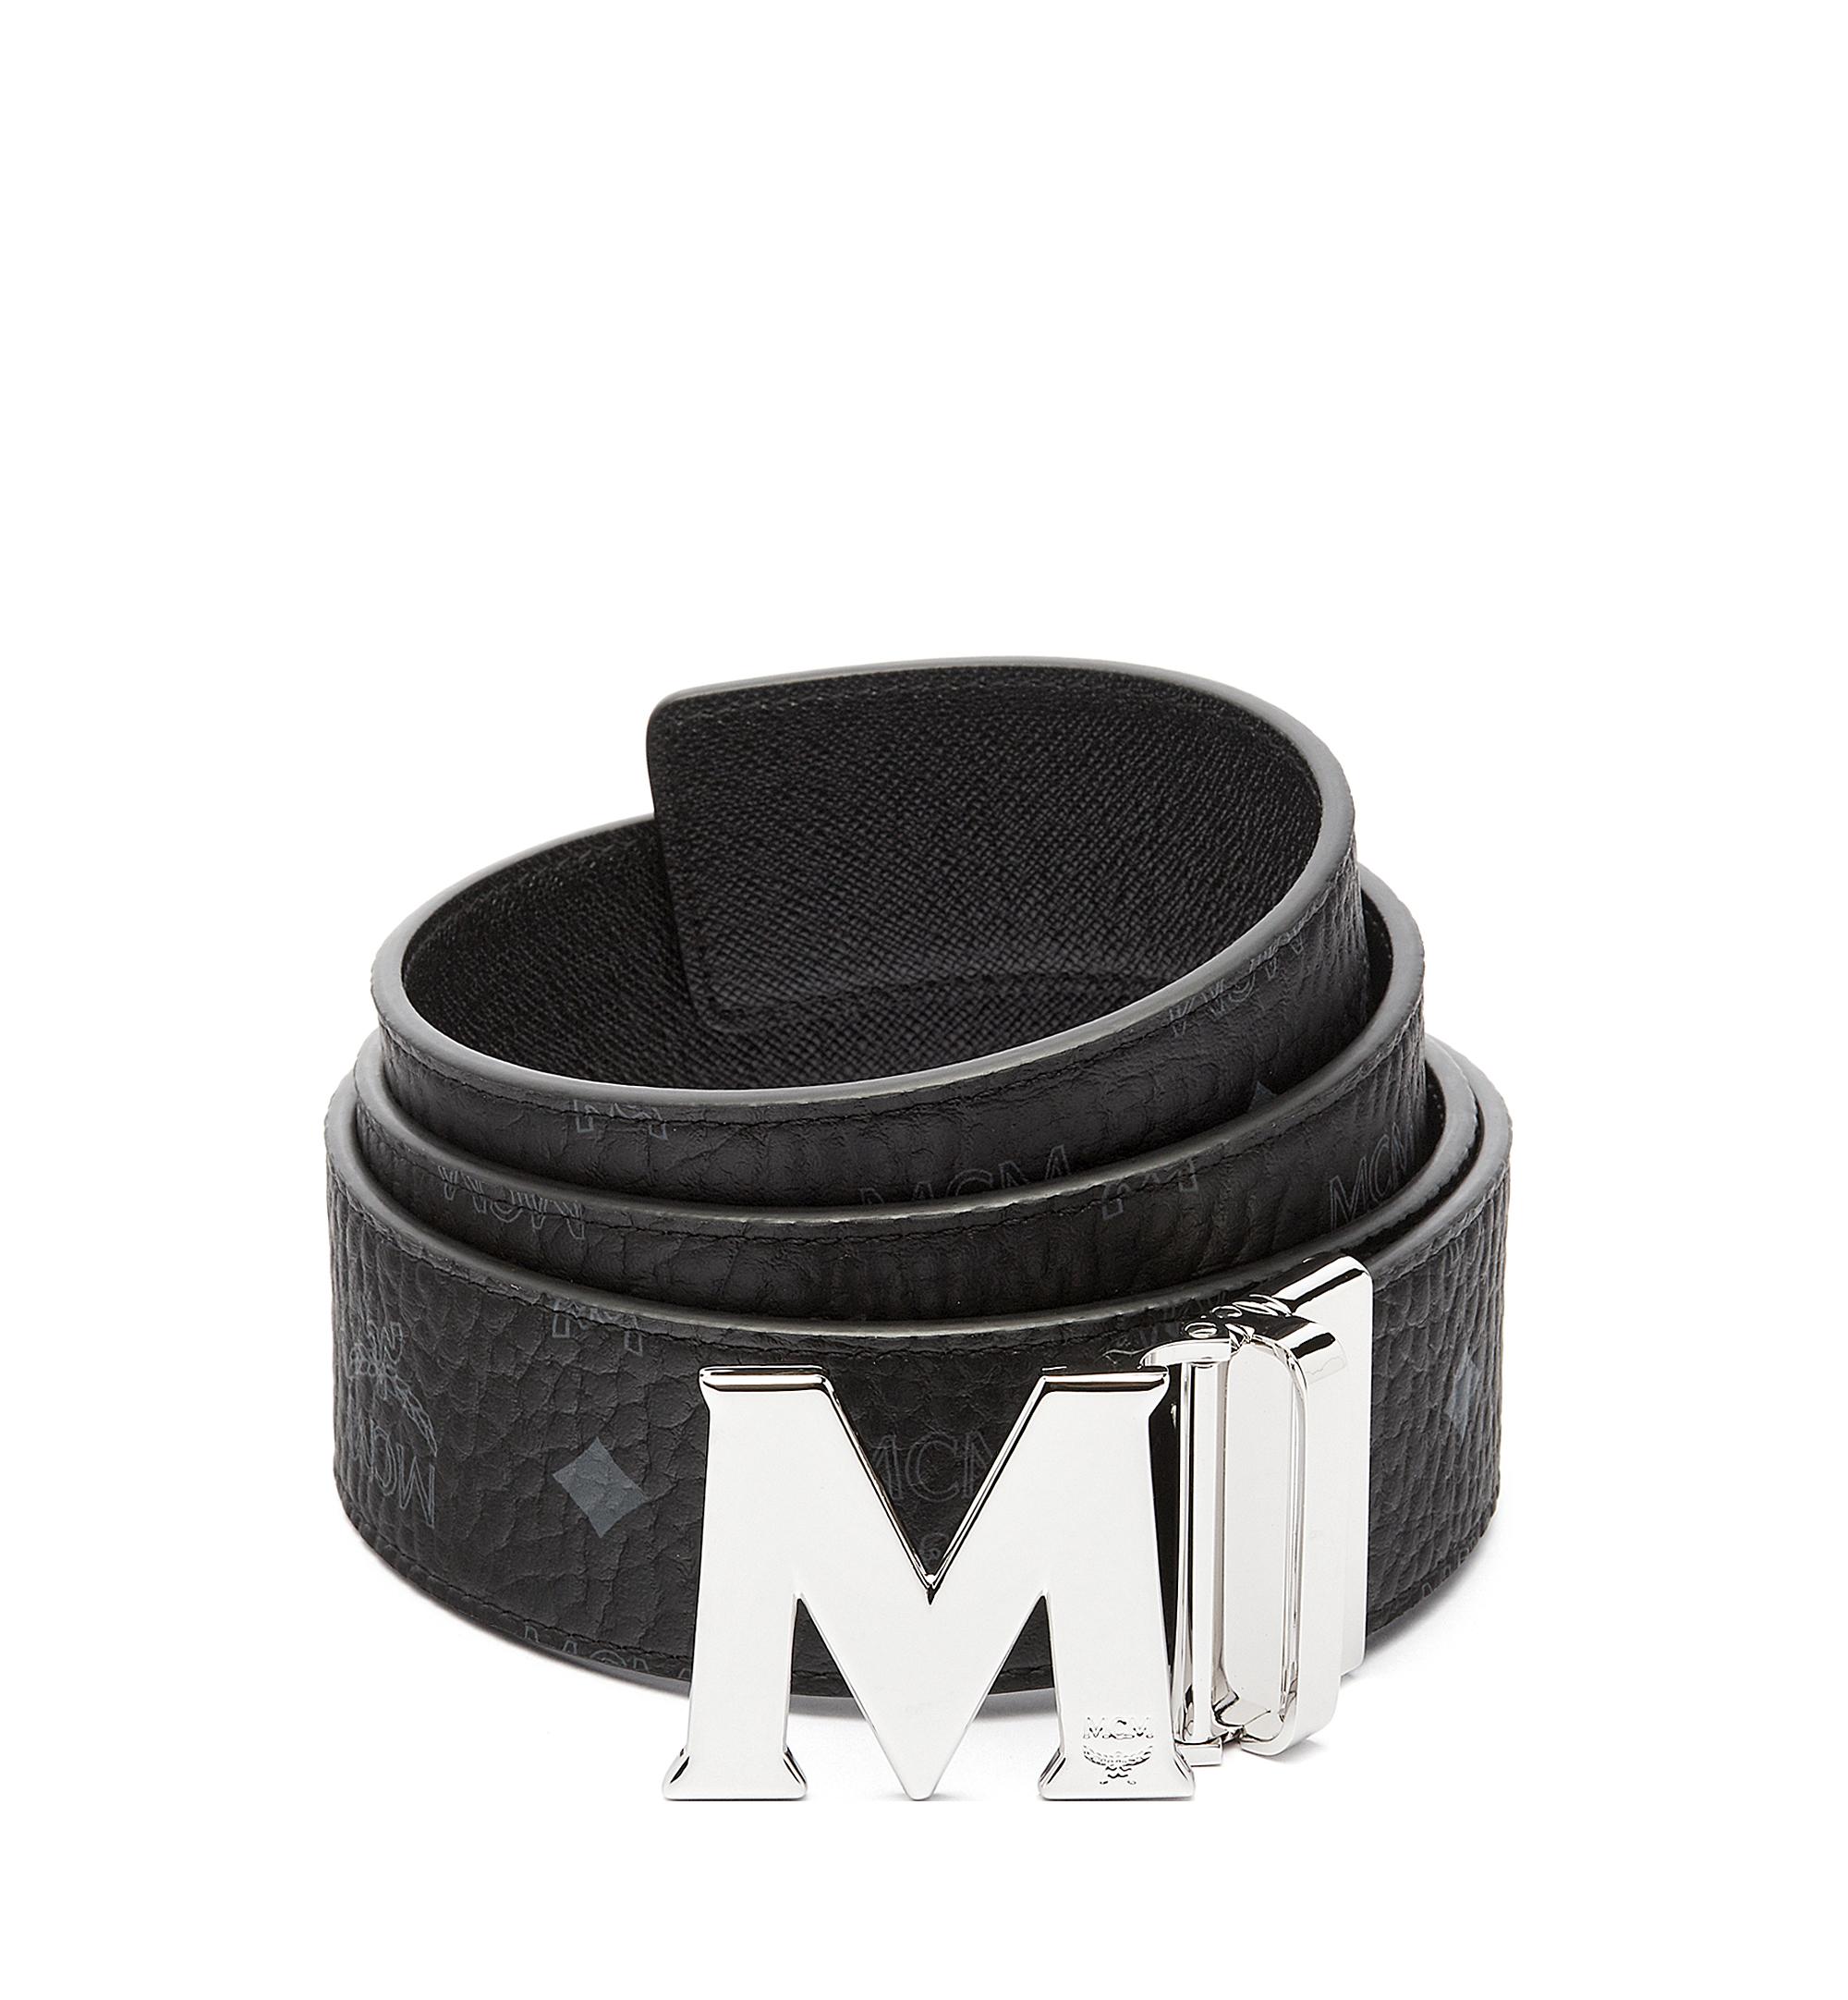 MCM Claus M Reversible Belt 4.5 cm in Visetos Black MXB6AVI03BK001 Alternate View 1